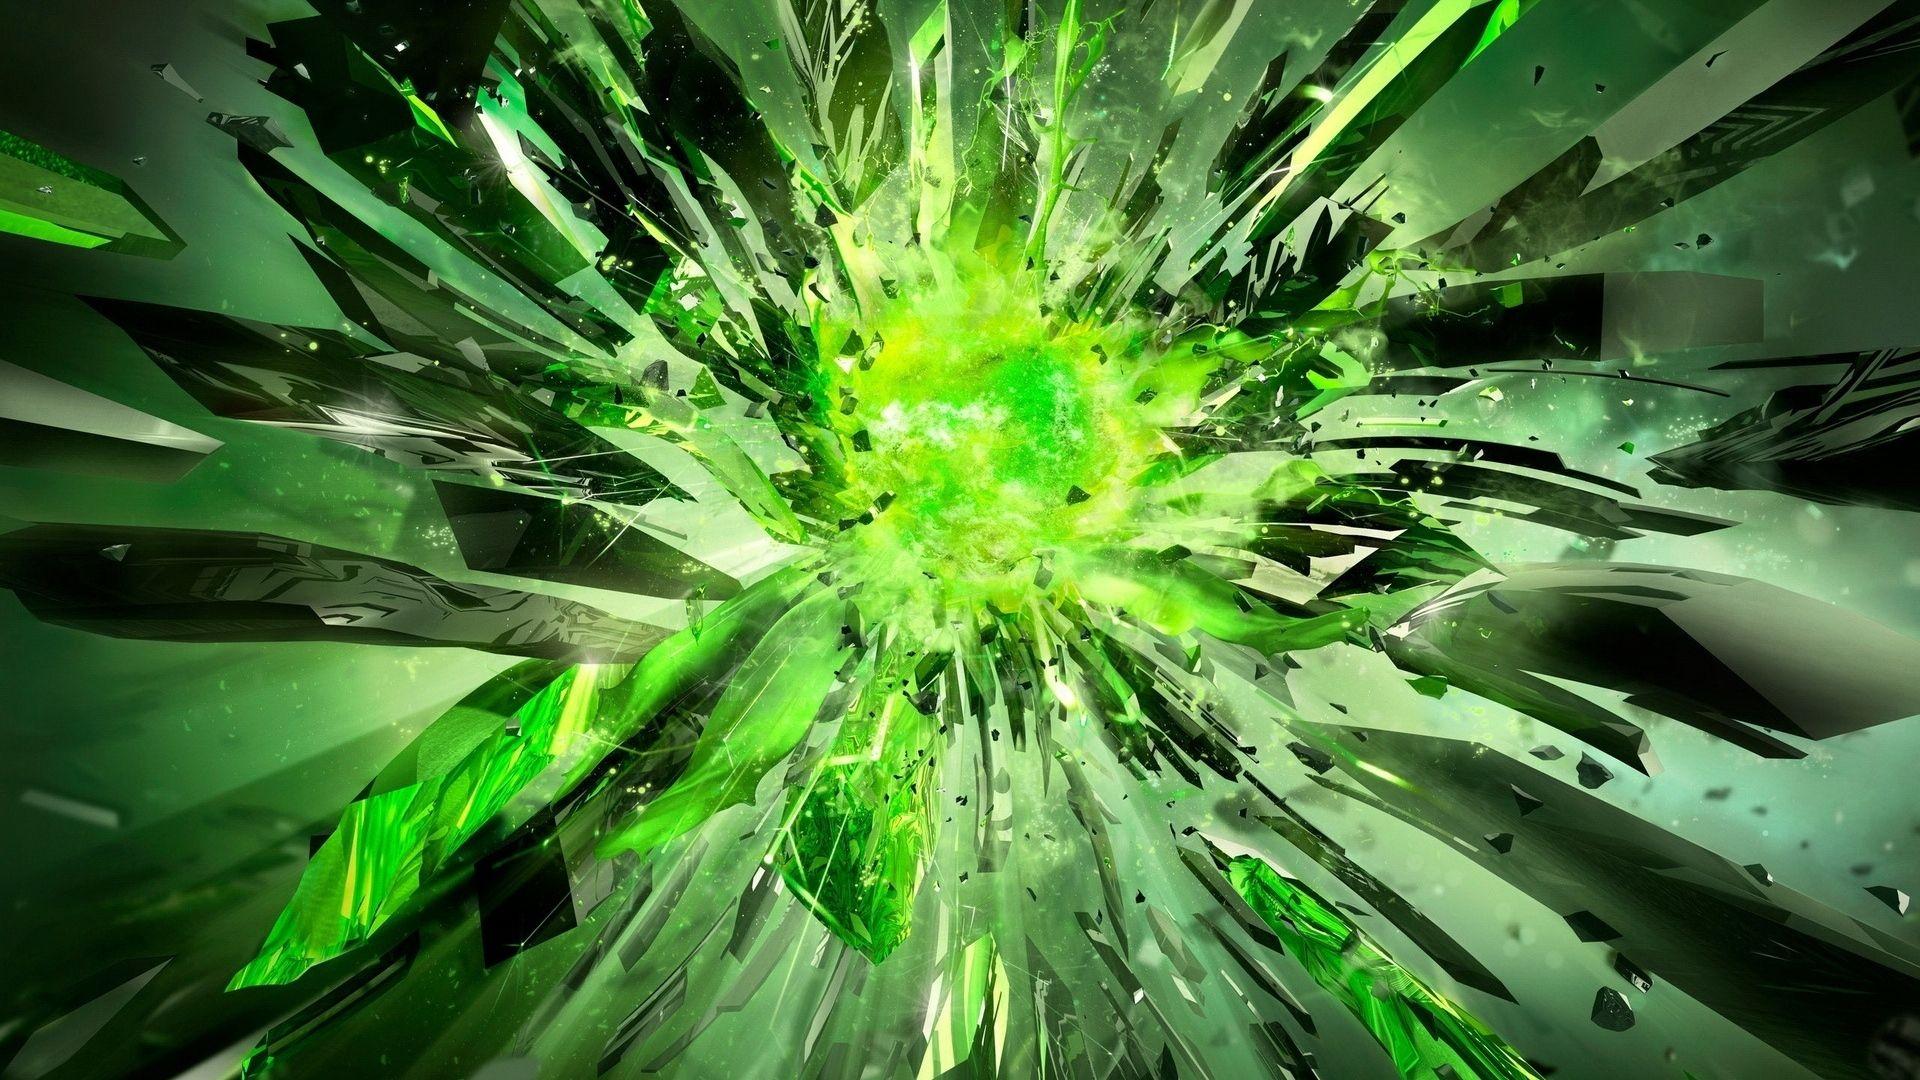 Cool Green 1080p wallpaper